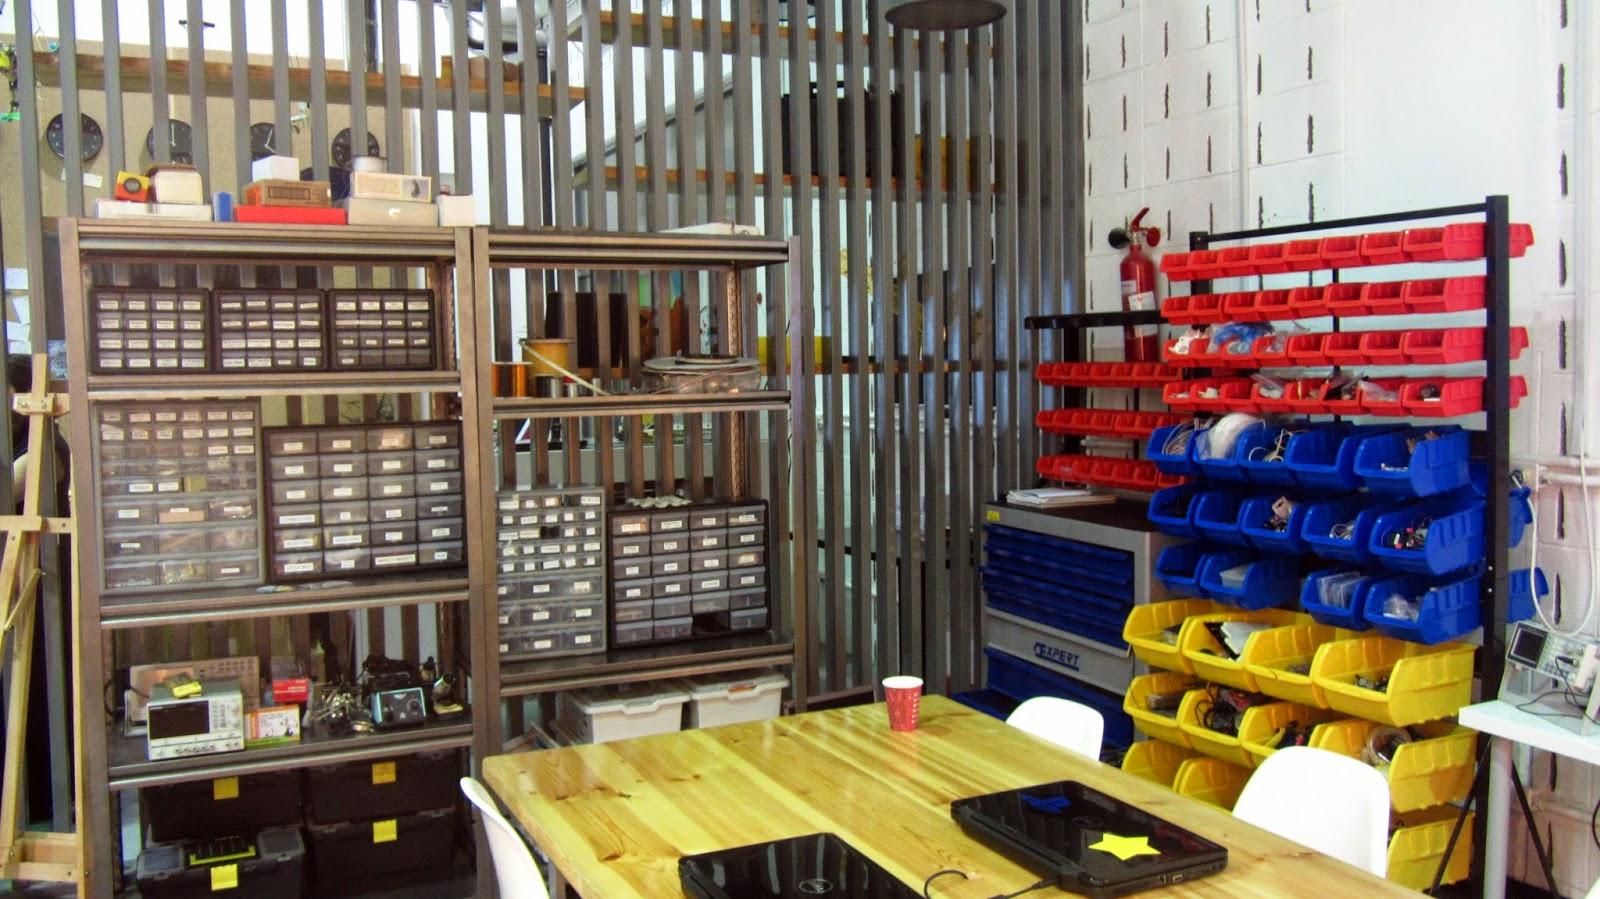 Electronics Arduino FABLAB KFUPM Dhahran Saudi Arabia blog